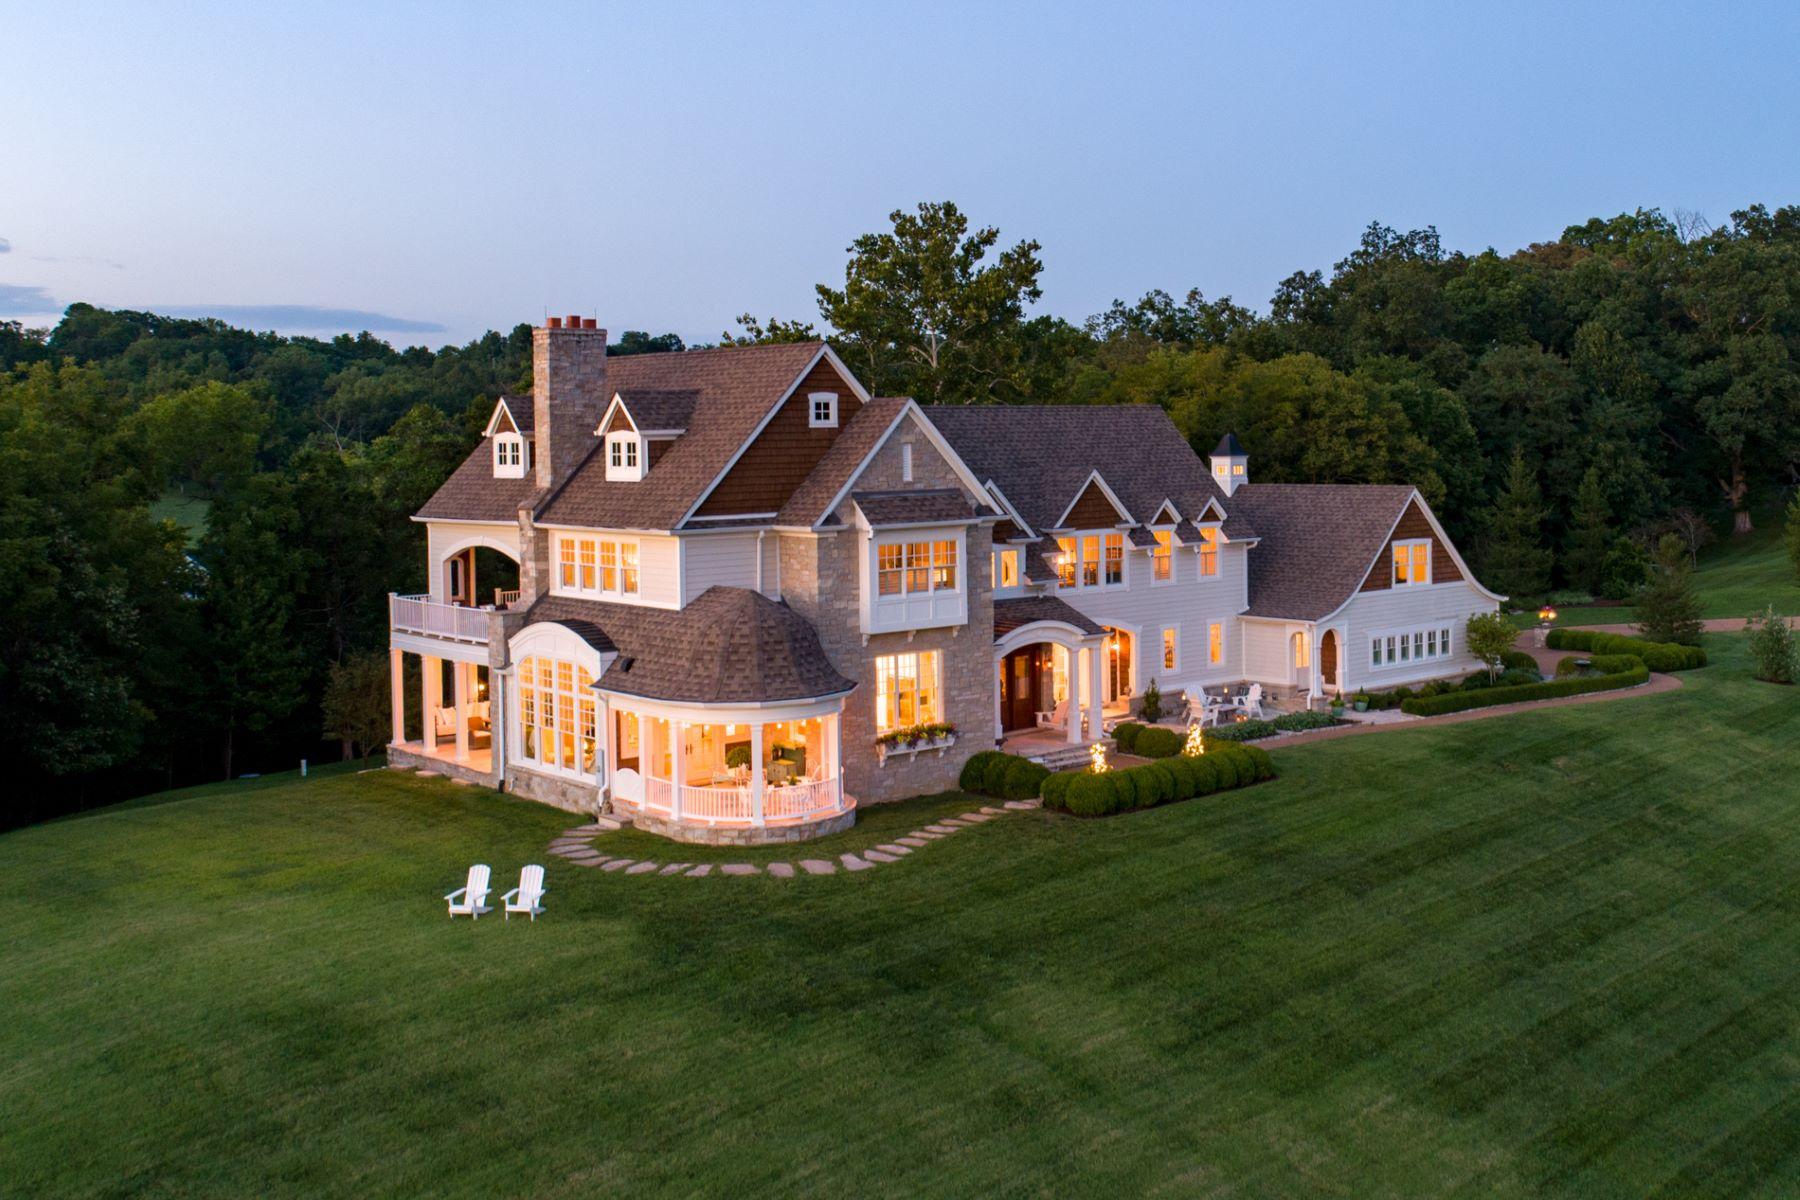 Property for Sale at Ro Bridge Ct 18615 Bo Ridge Court Wildwood, Missouri 63005 United States